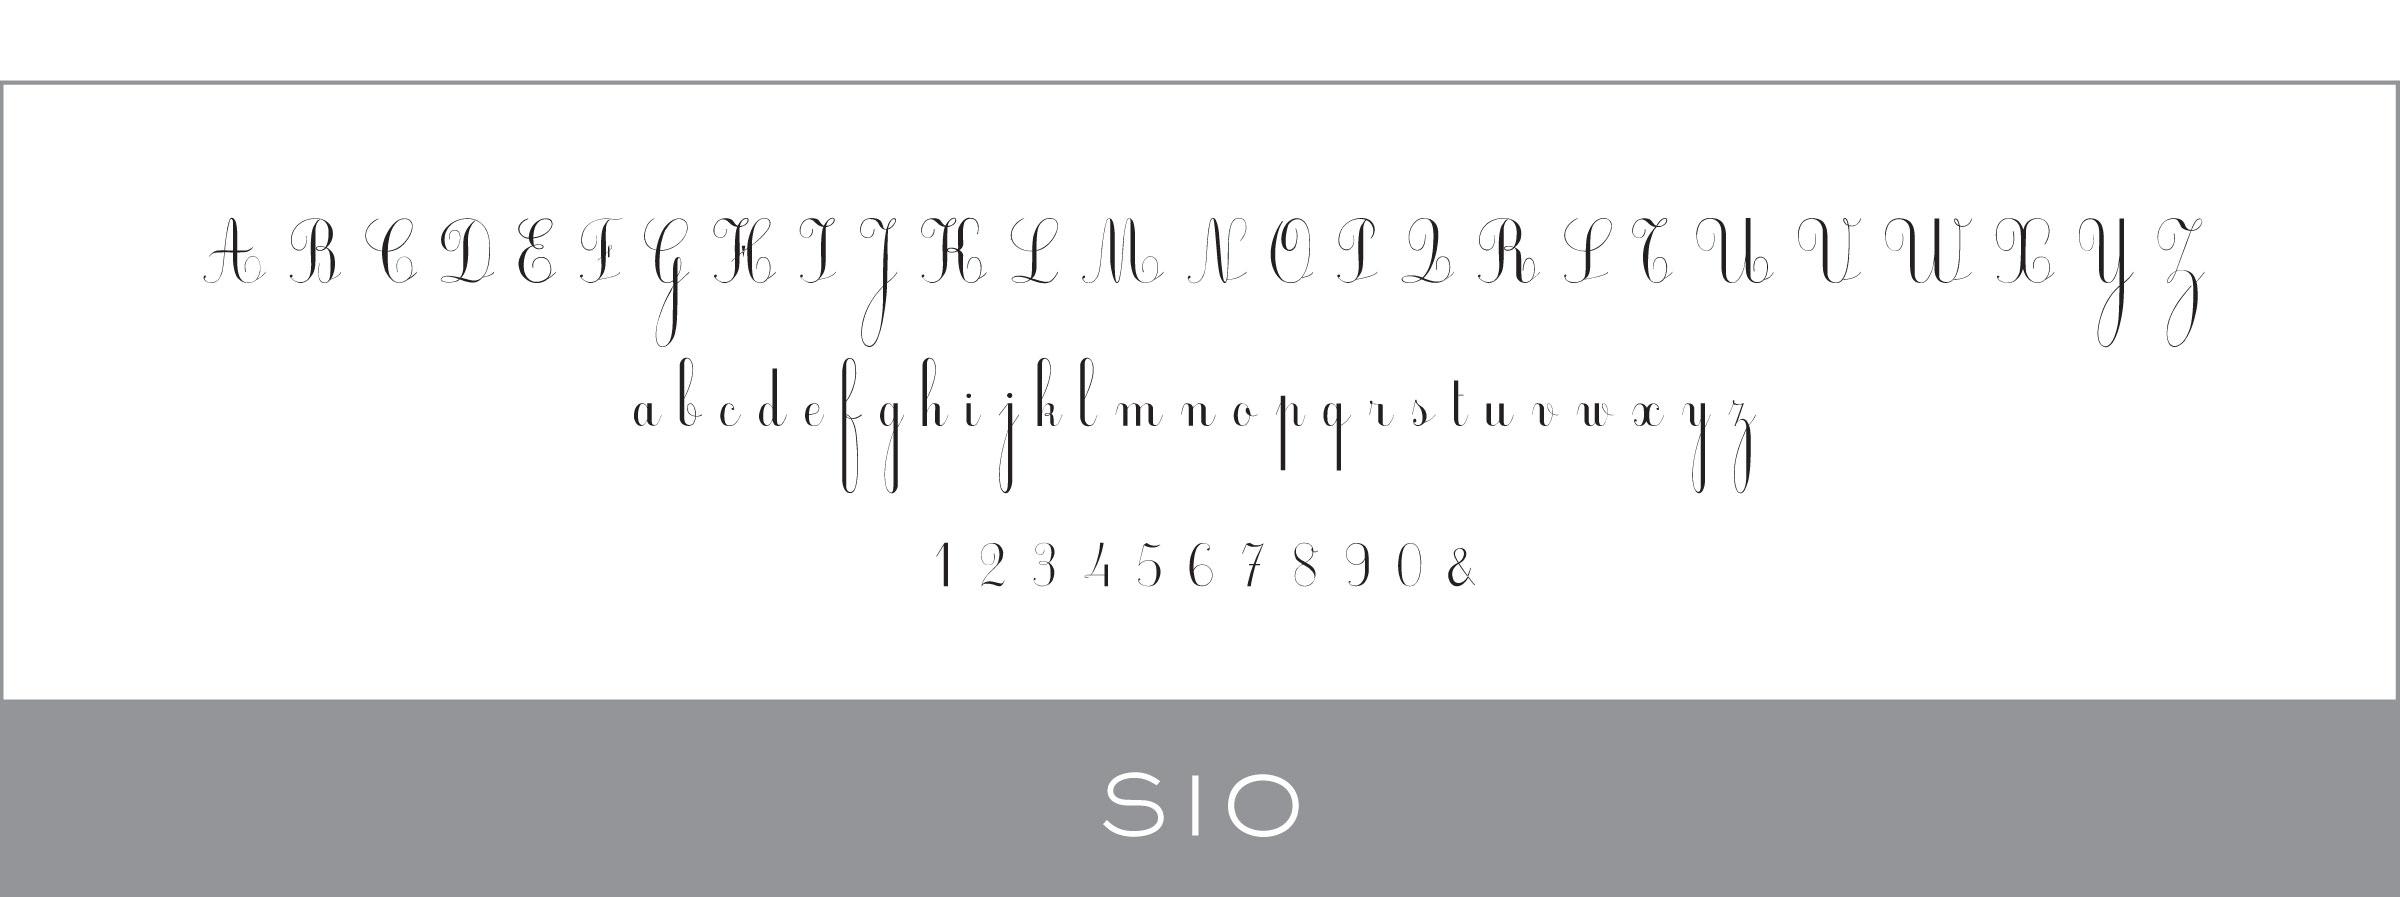 S10_Haute_Papier_Font.jpg